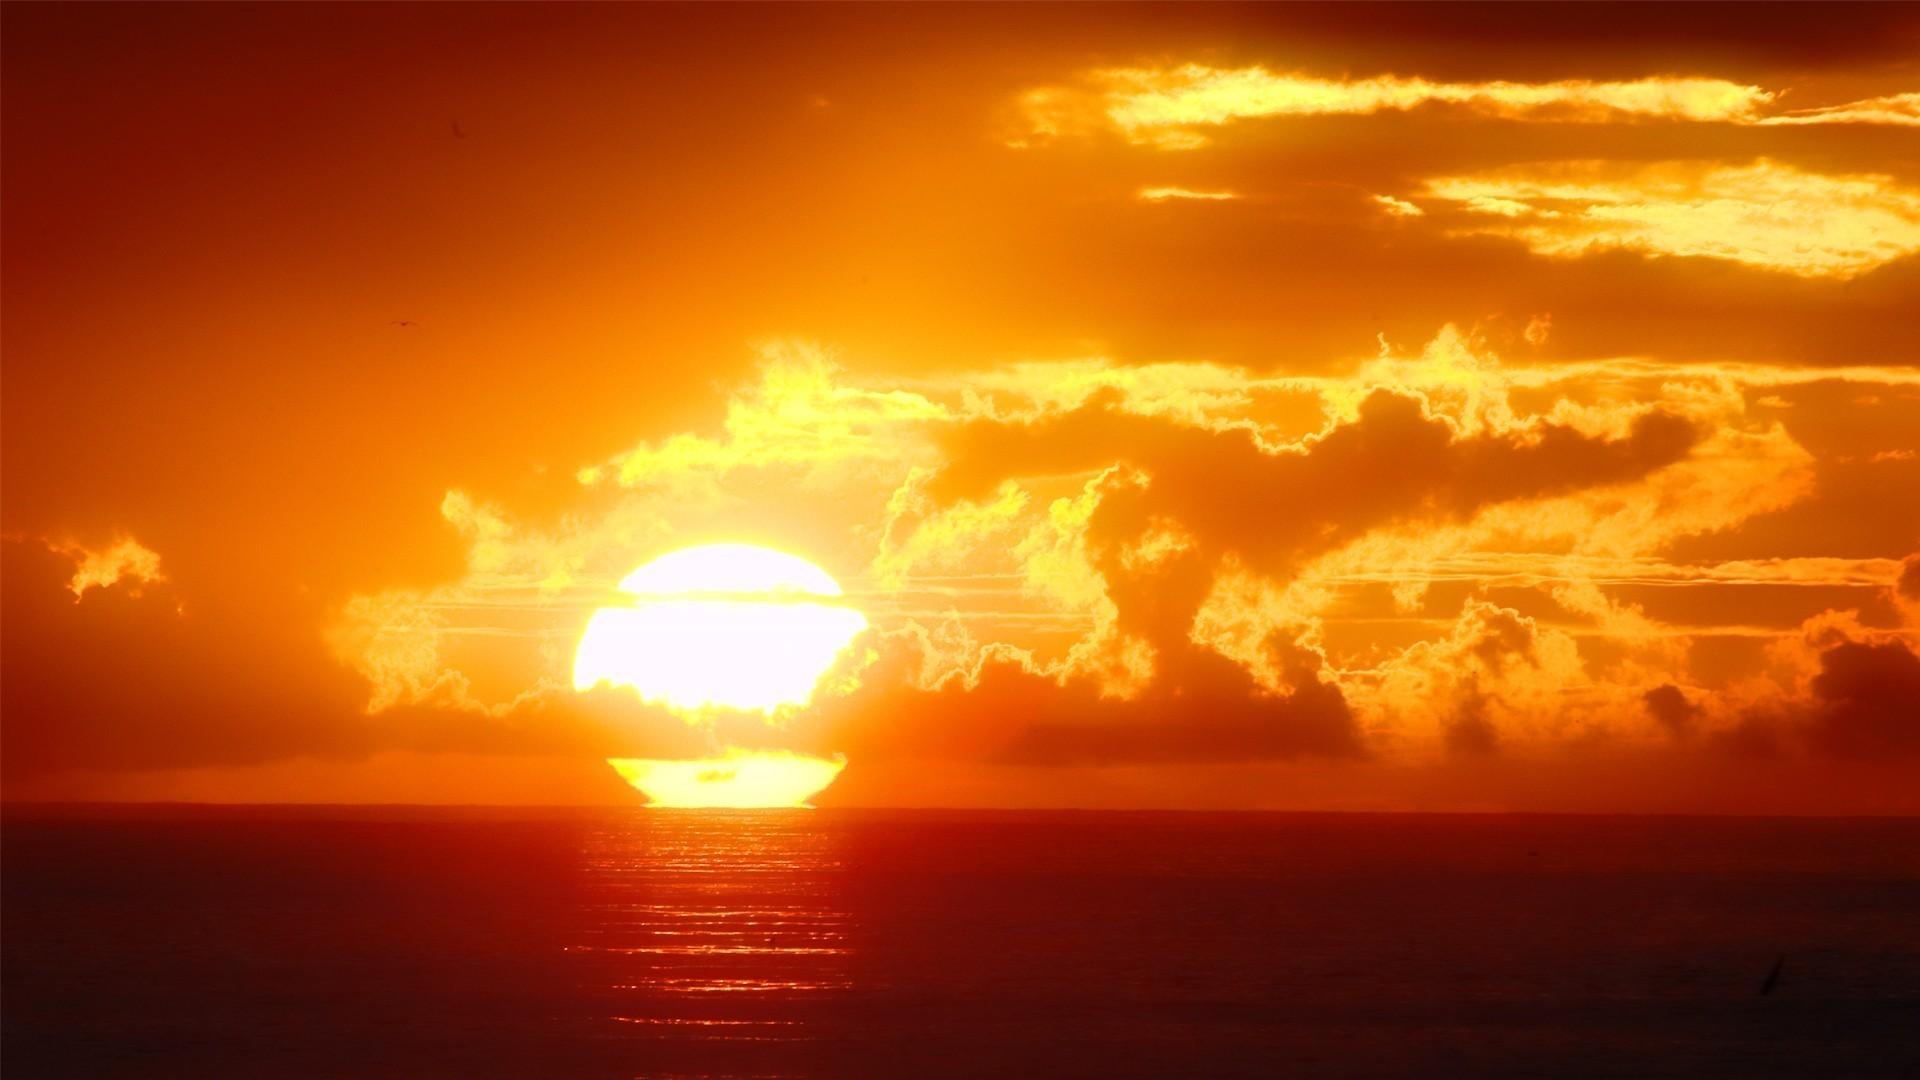 Sunset wallpaper - 787057